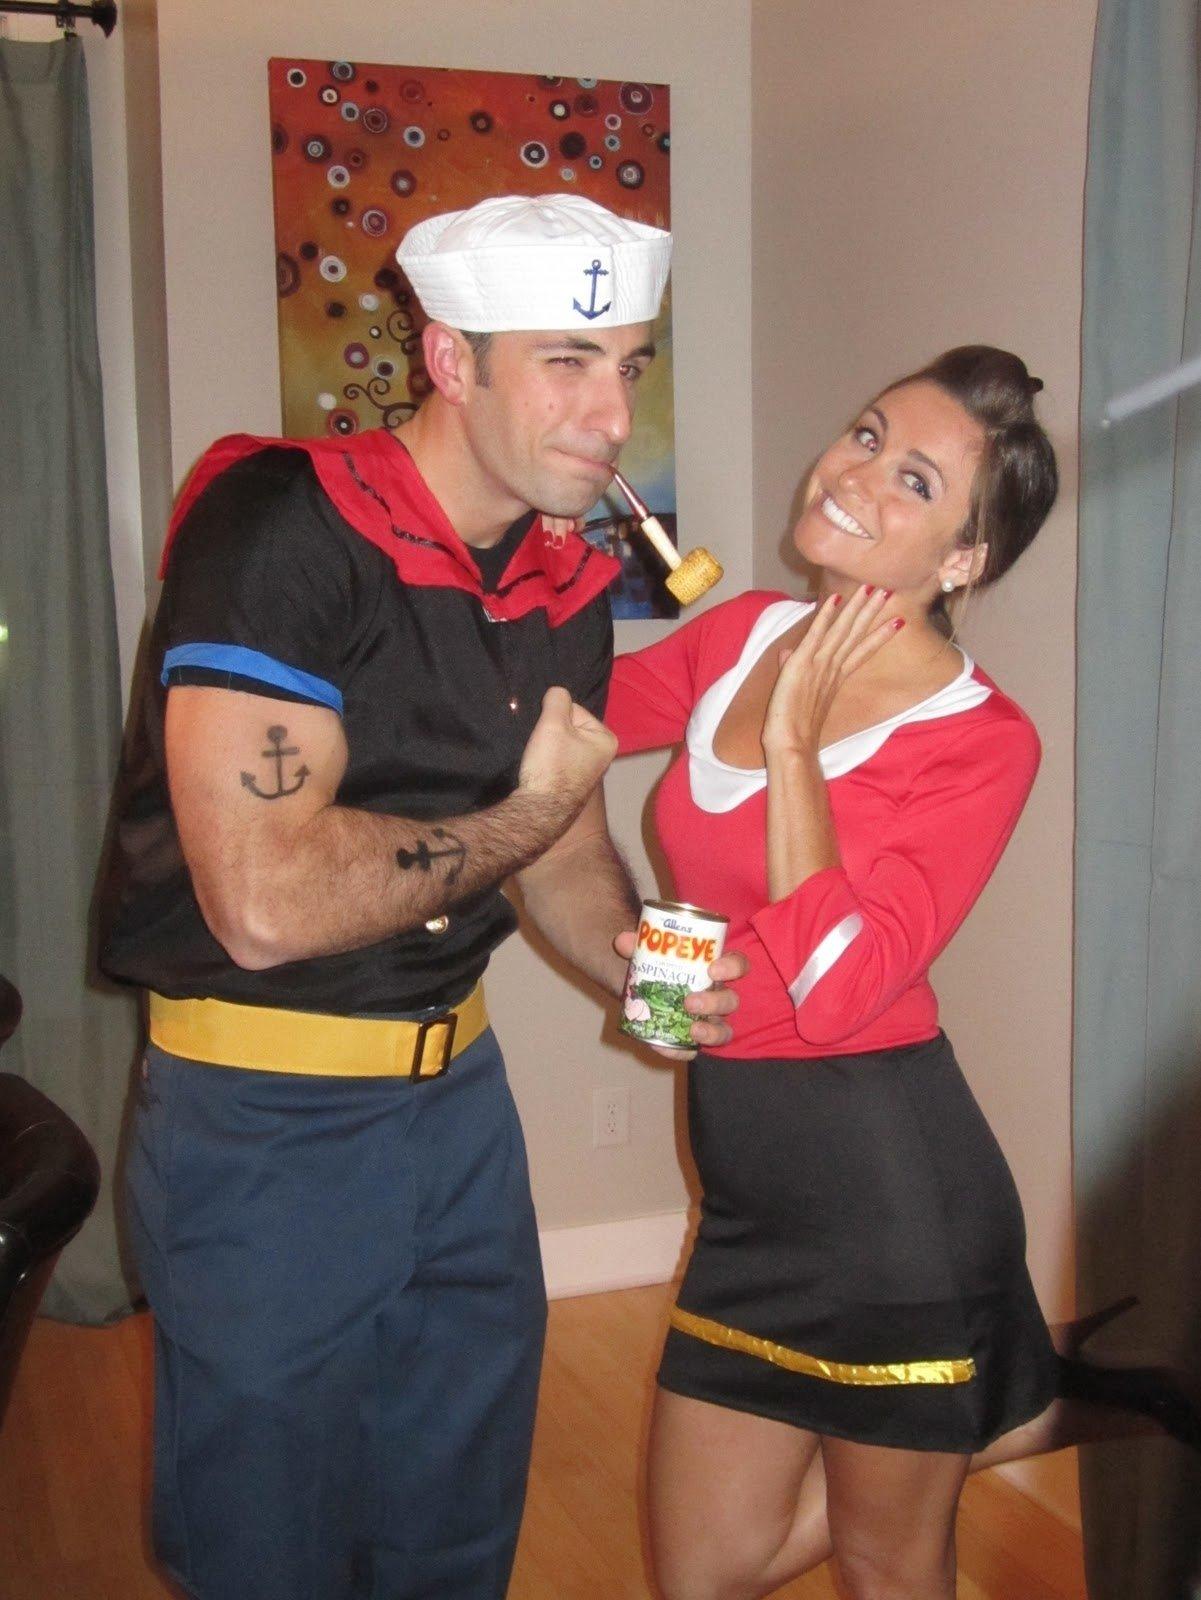 10 Pretty Good Couples Halloween Costume Ideas 25 genius diy couples costumes brit co 12 2020